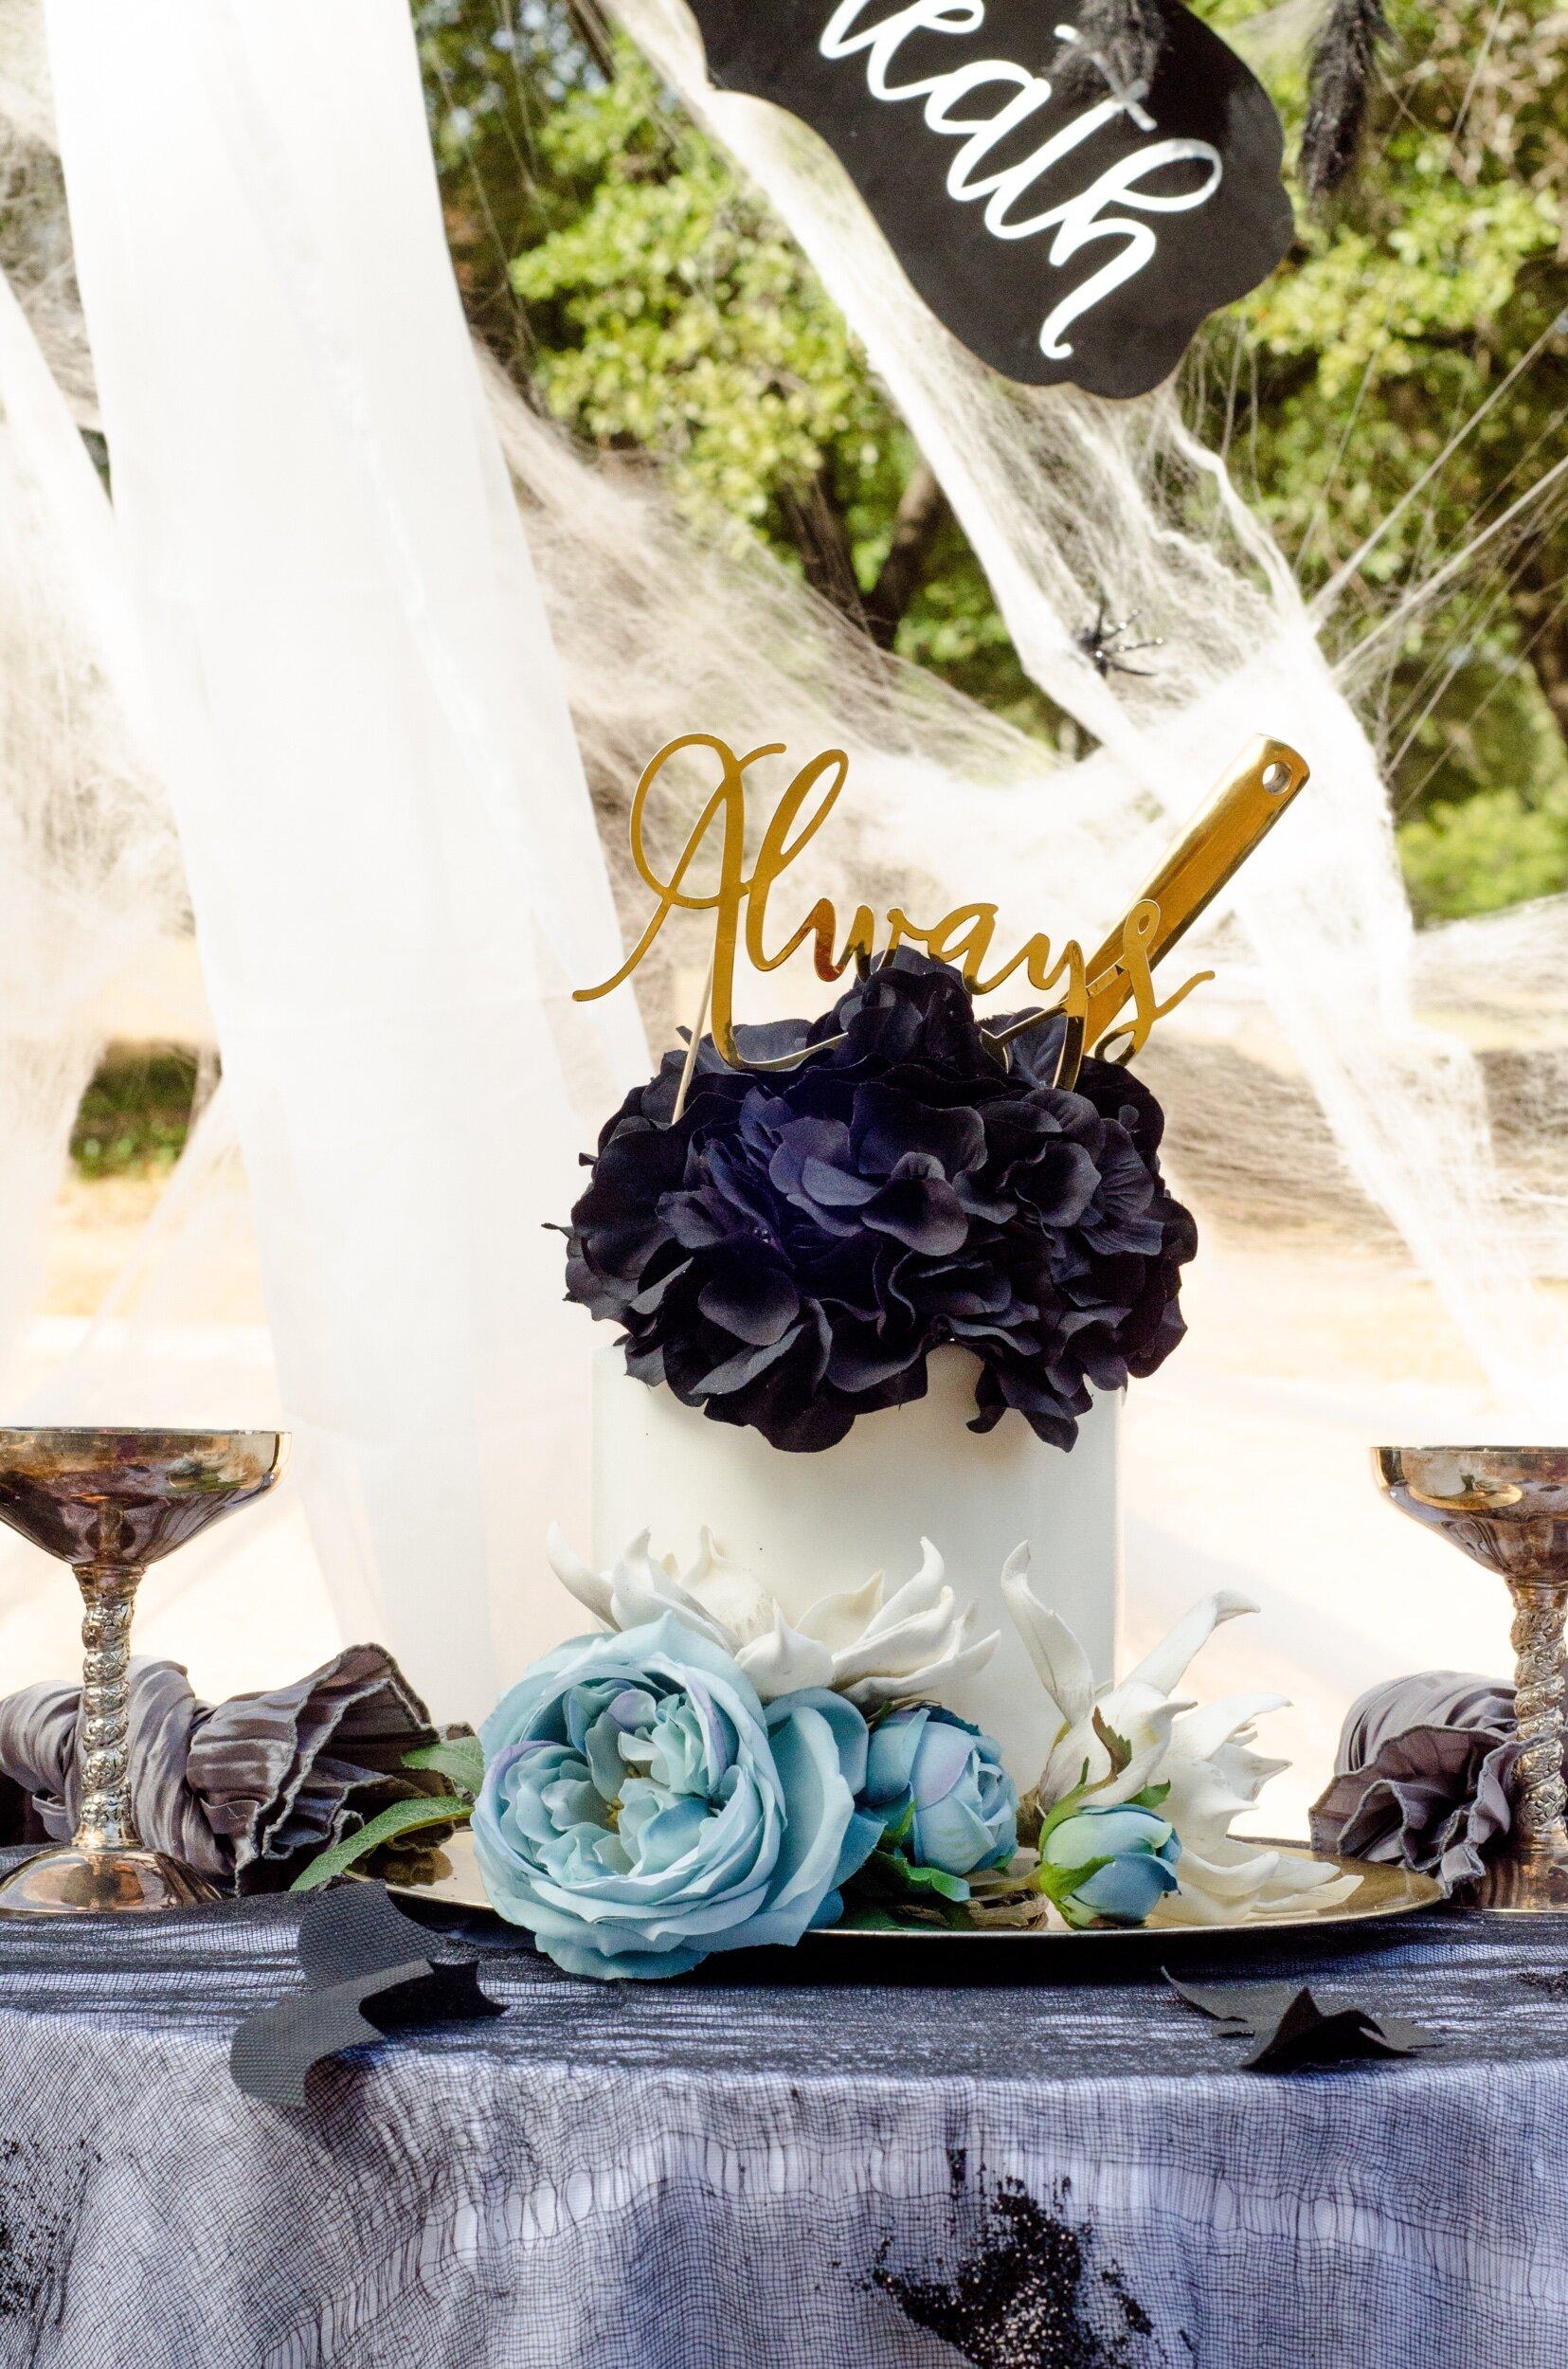 Gothic wedding cake idea for halloween weddings - as seen onMint Event Design